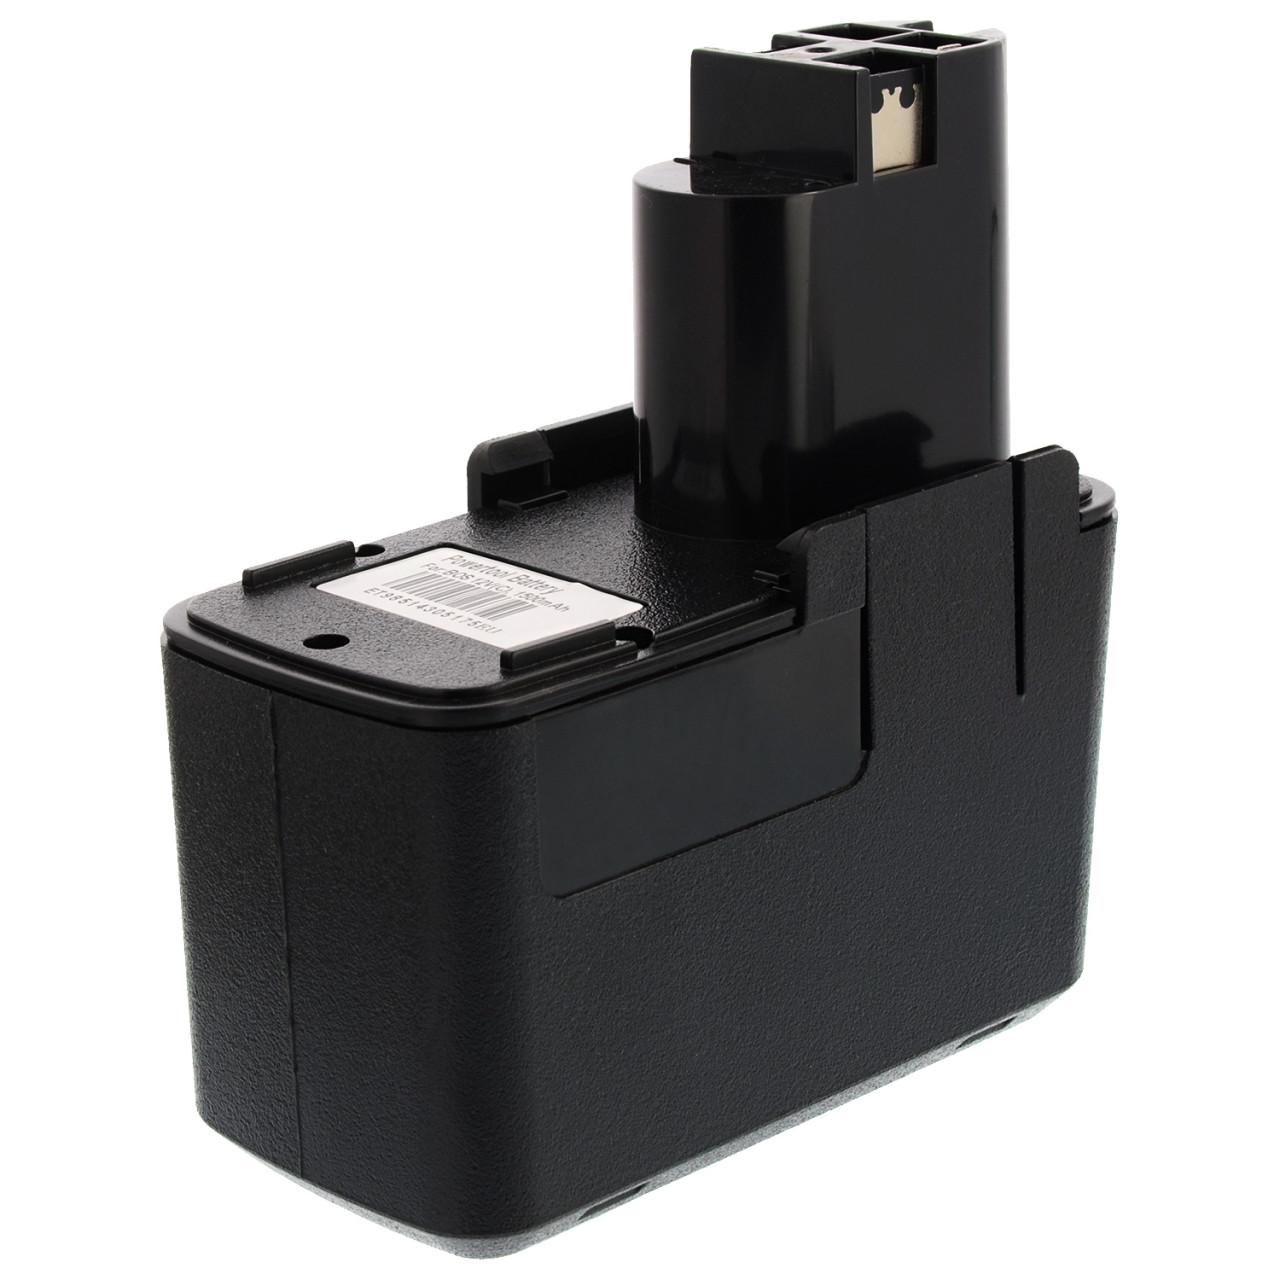 Akku für Bosch ABS, ASG, AHS, BH, GBM, GLI, GSB, GSR, PSR, PSB, 12V, 2.5Ah, w...